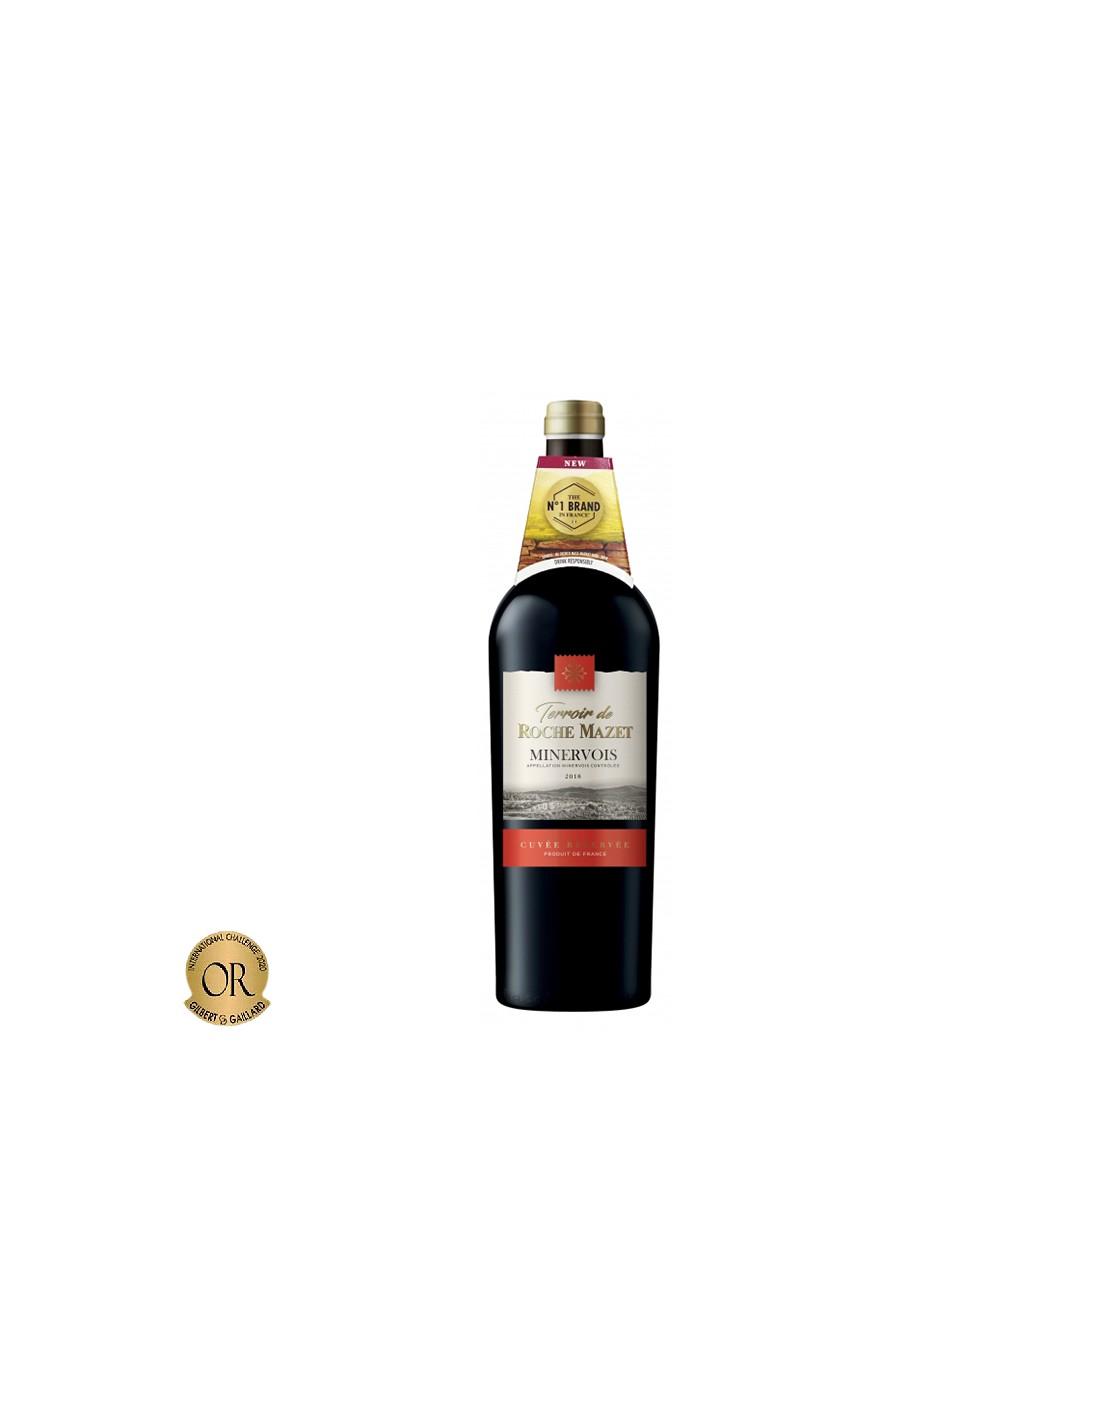 Vin rosu, Cupaj, Terroir de Roche Mazet, Minervois Cuvee Reserve, 0.75L, 13.5% alc., Franta